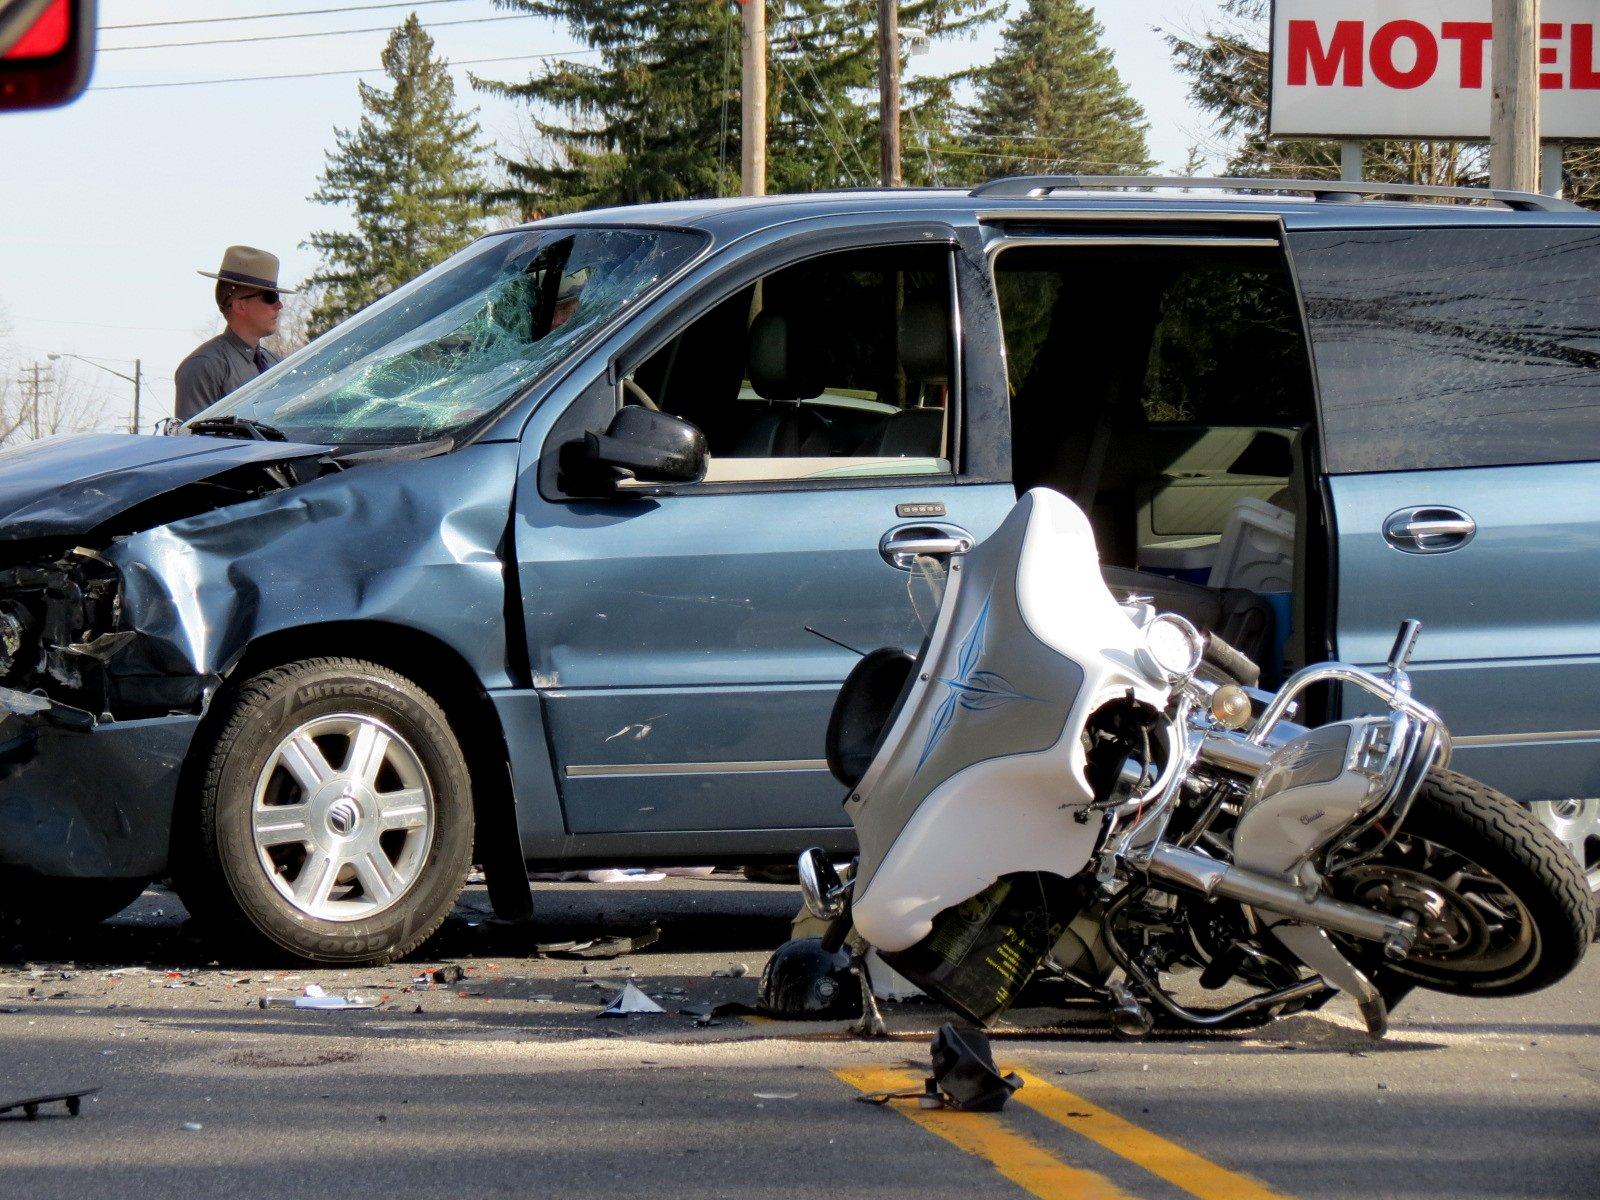 Local Car Auctions >> Bethlehem man victim of car-motorcycle collision